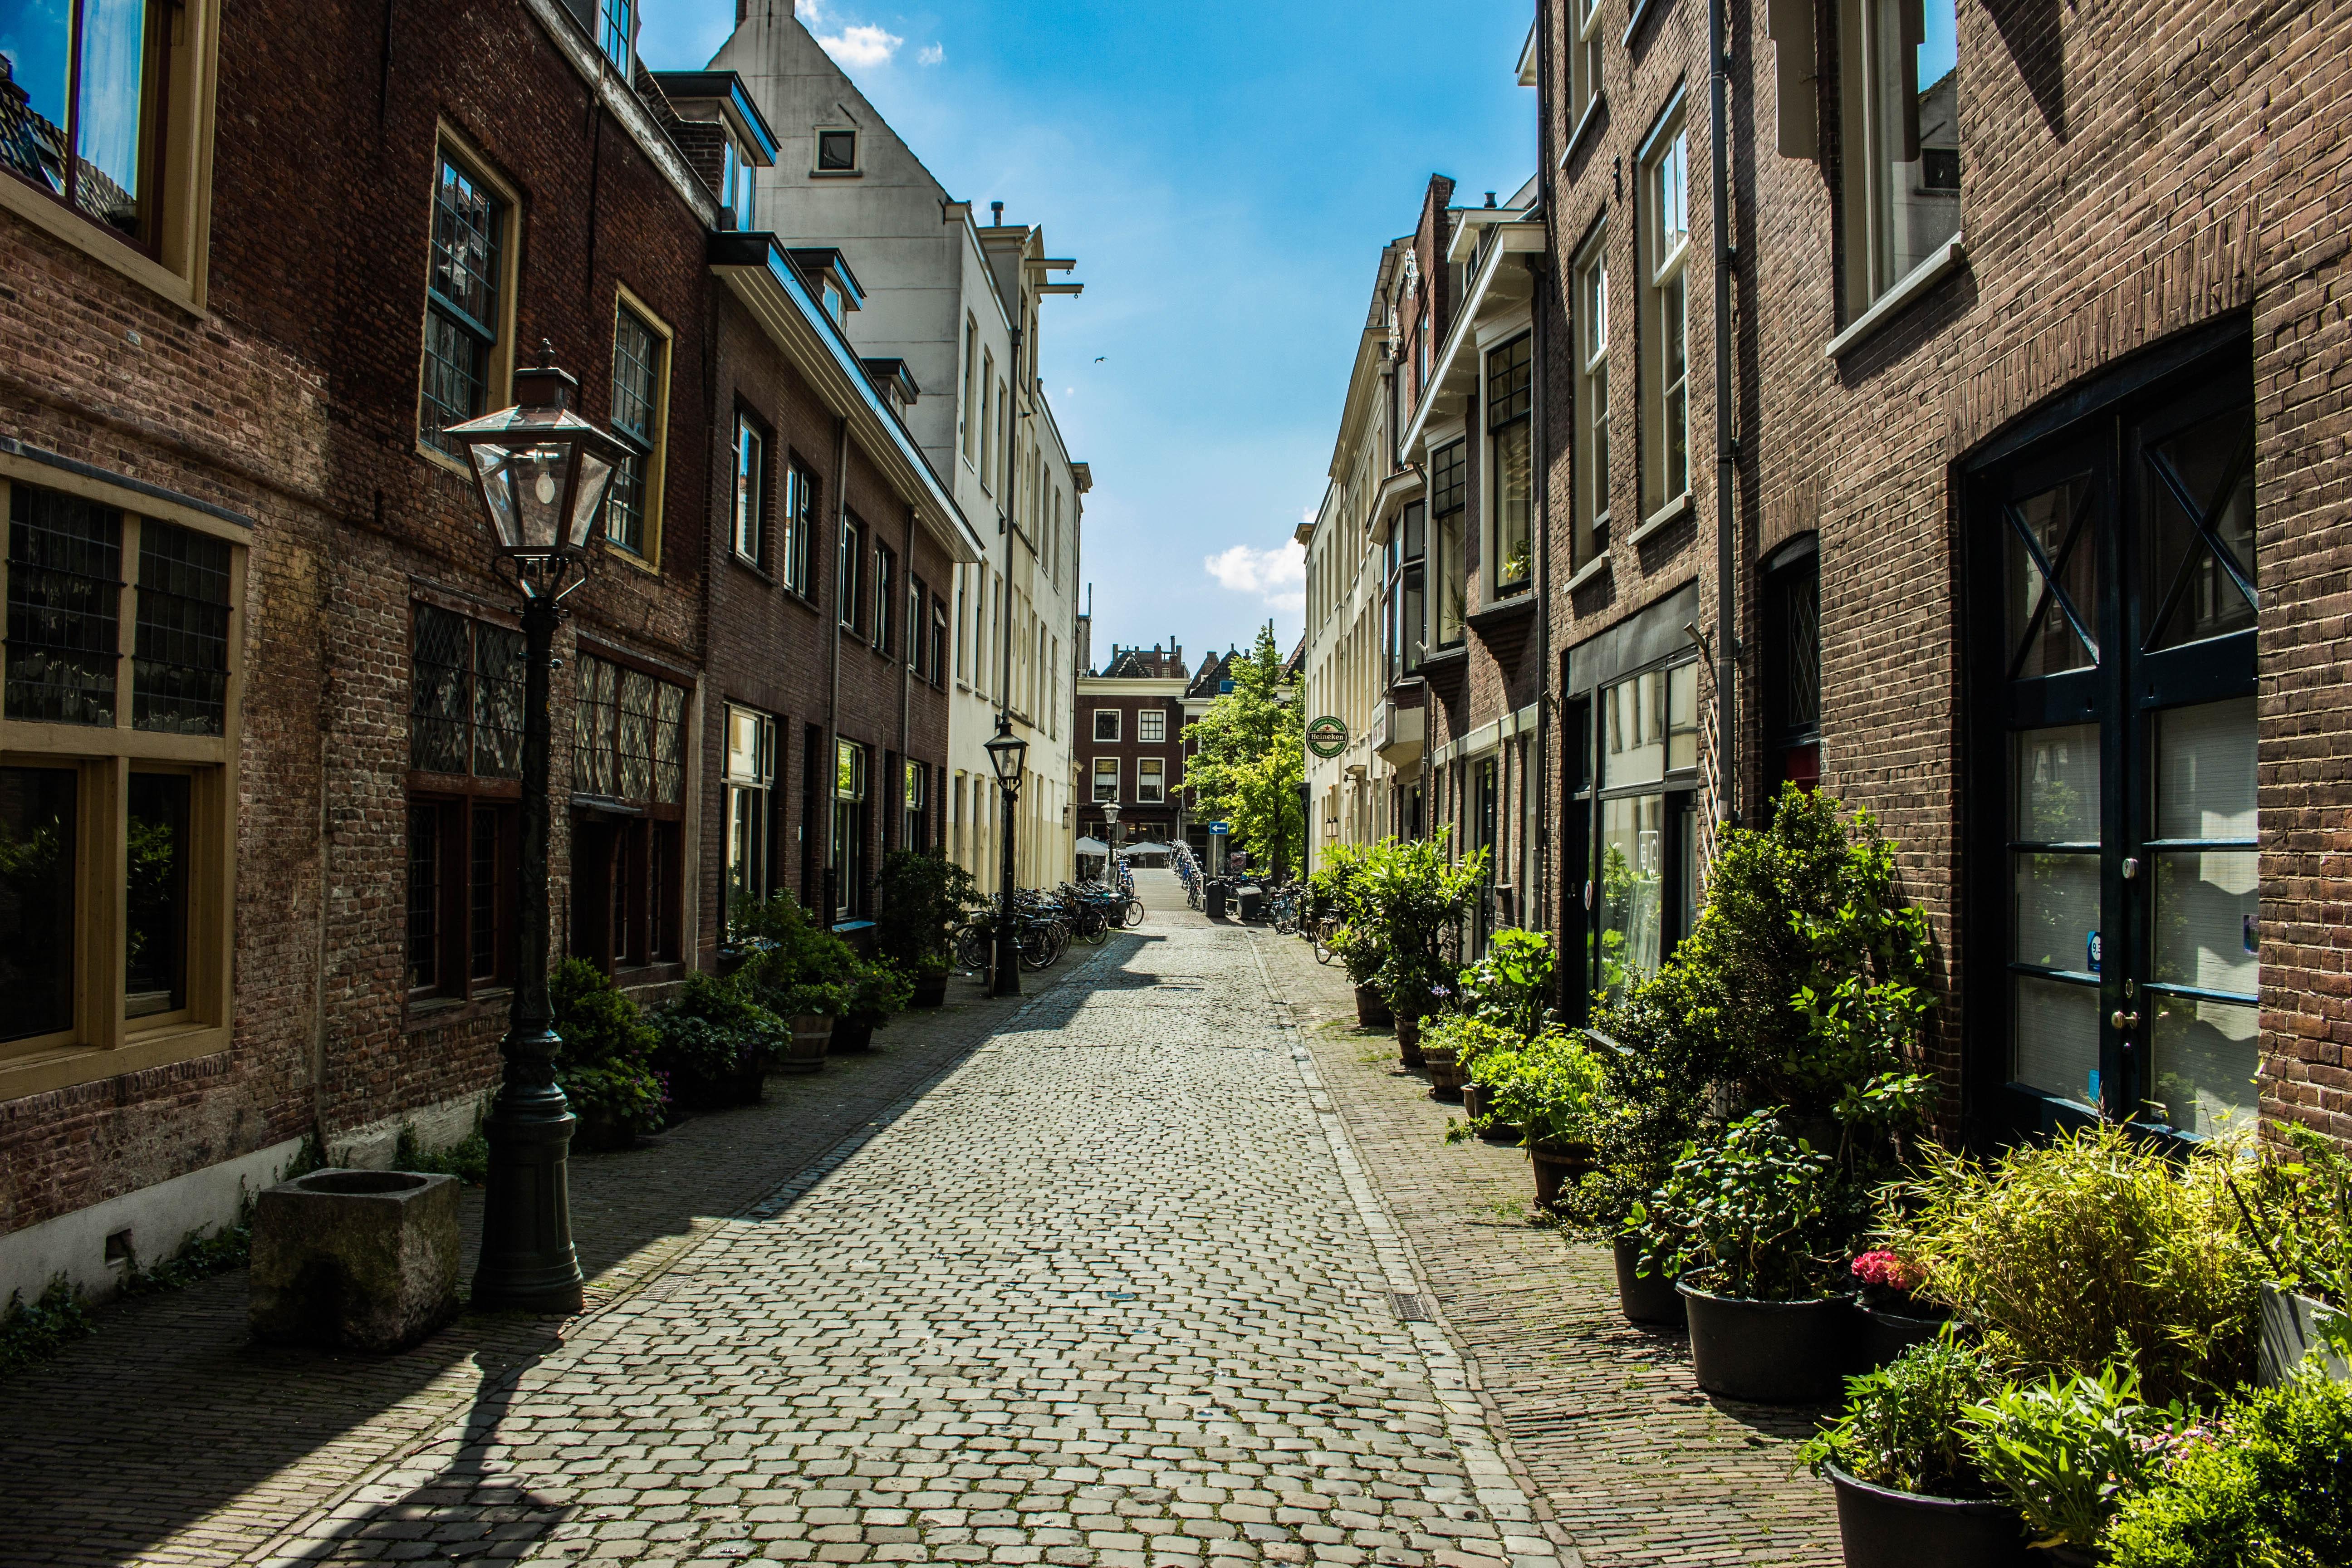 View Of City Street 183 Free Stock Photo